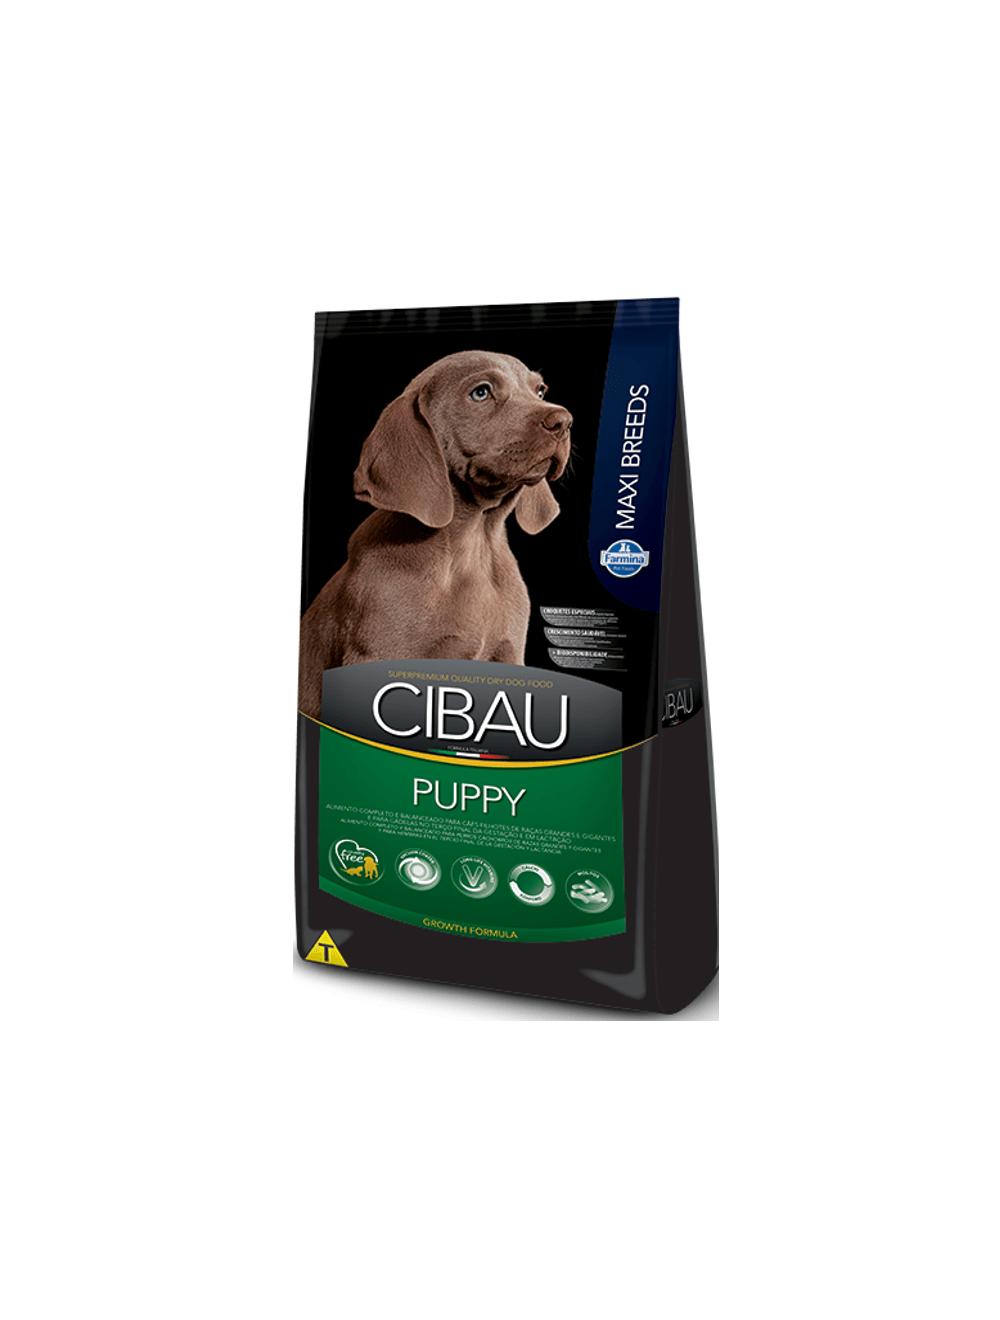 Comida Cibau Puppy Maxi Breed 25 kg - Ciudaddemascotas.com